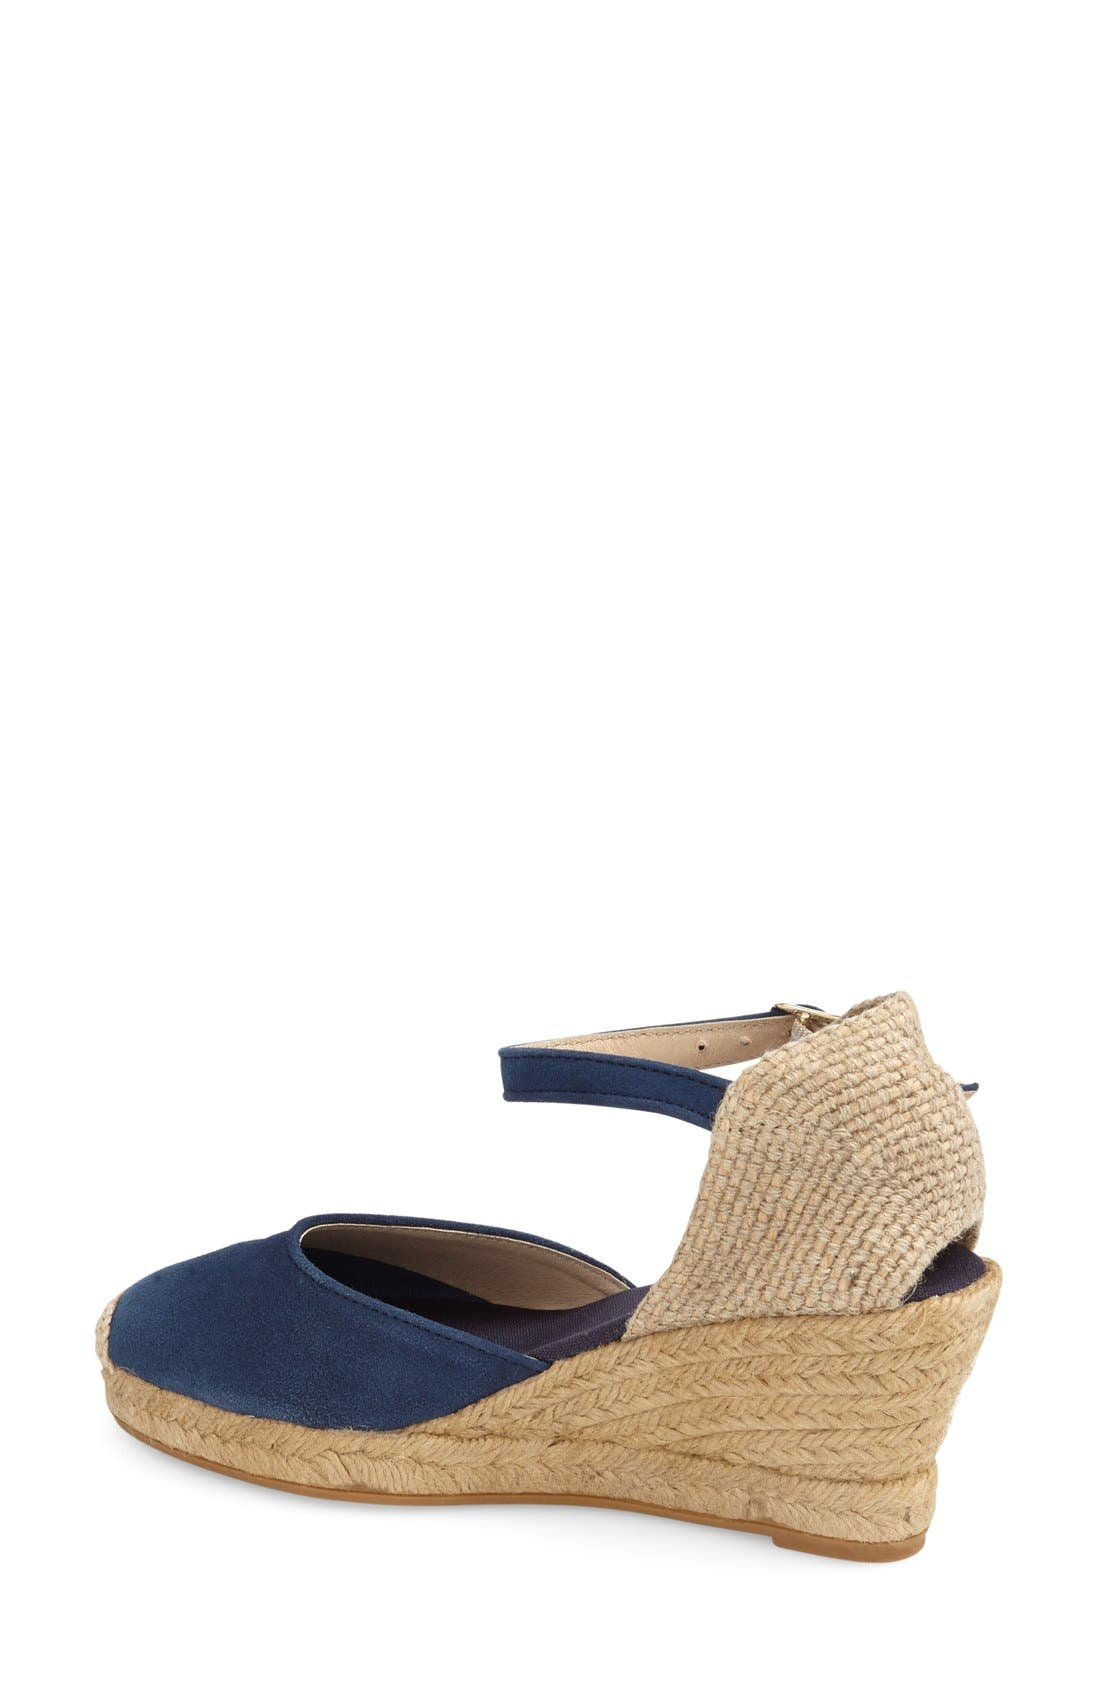 TONI PONS, 'Lloret-5' Espadrille Wedge Sandal, Alternate thumbnail 2, color, NAVY SUEDE